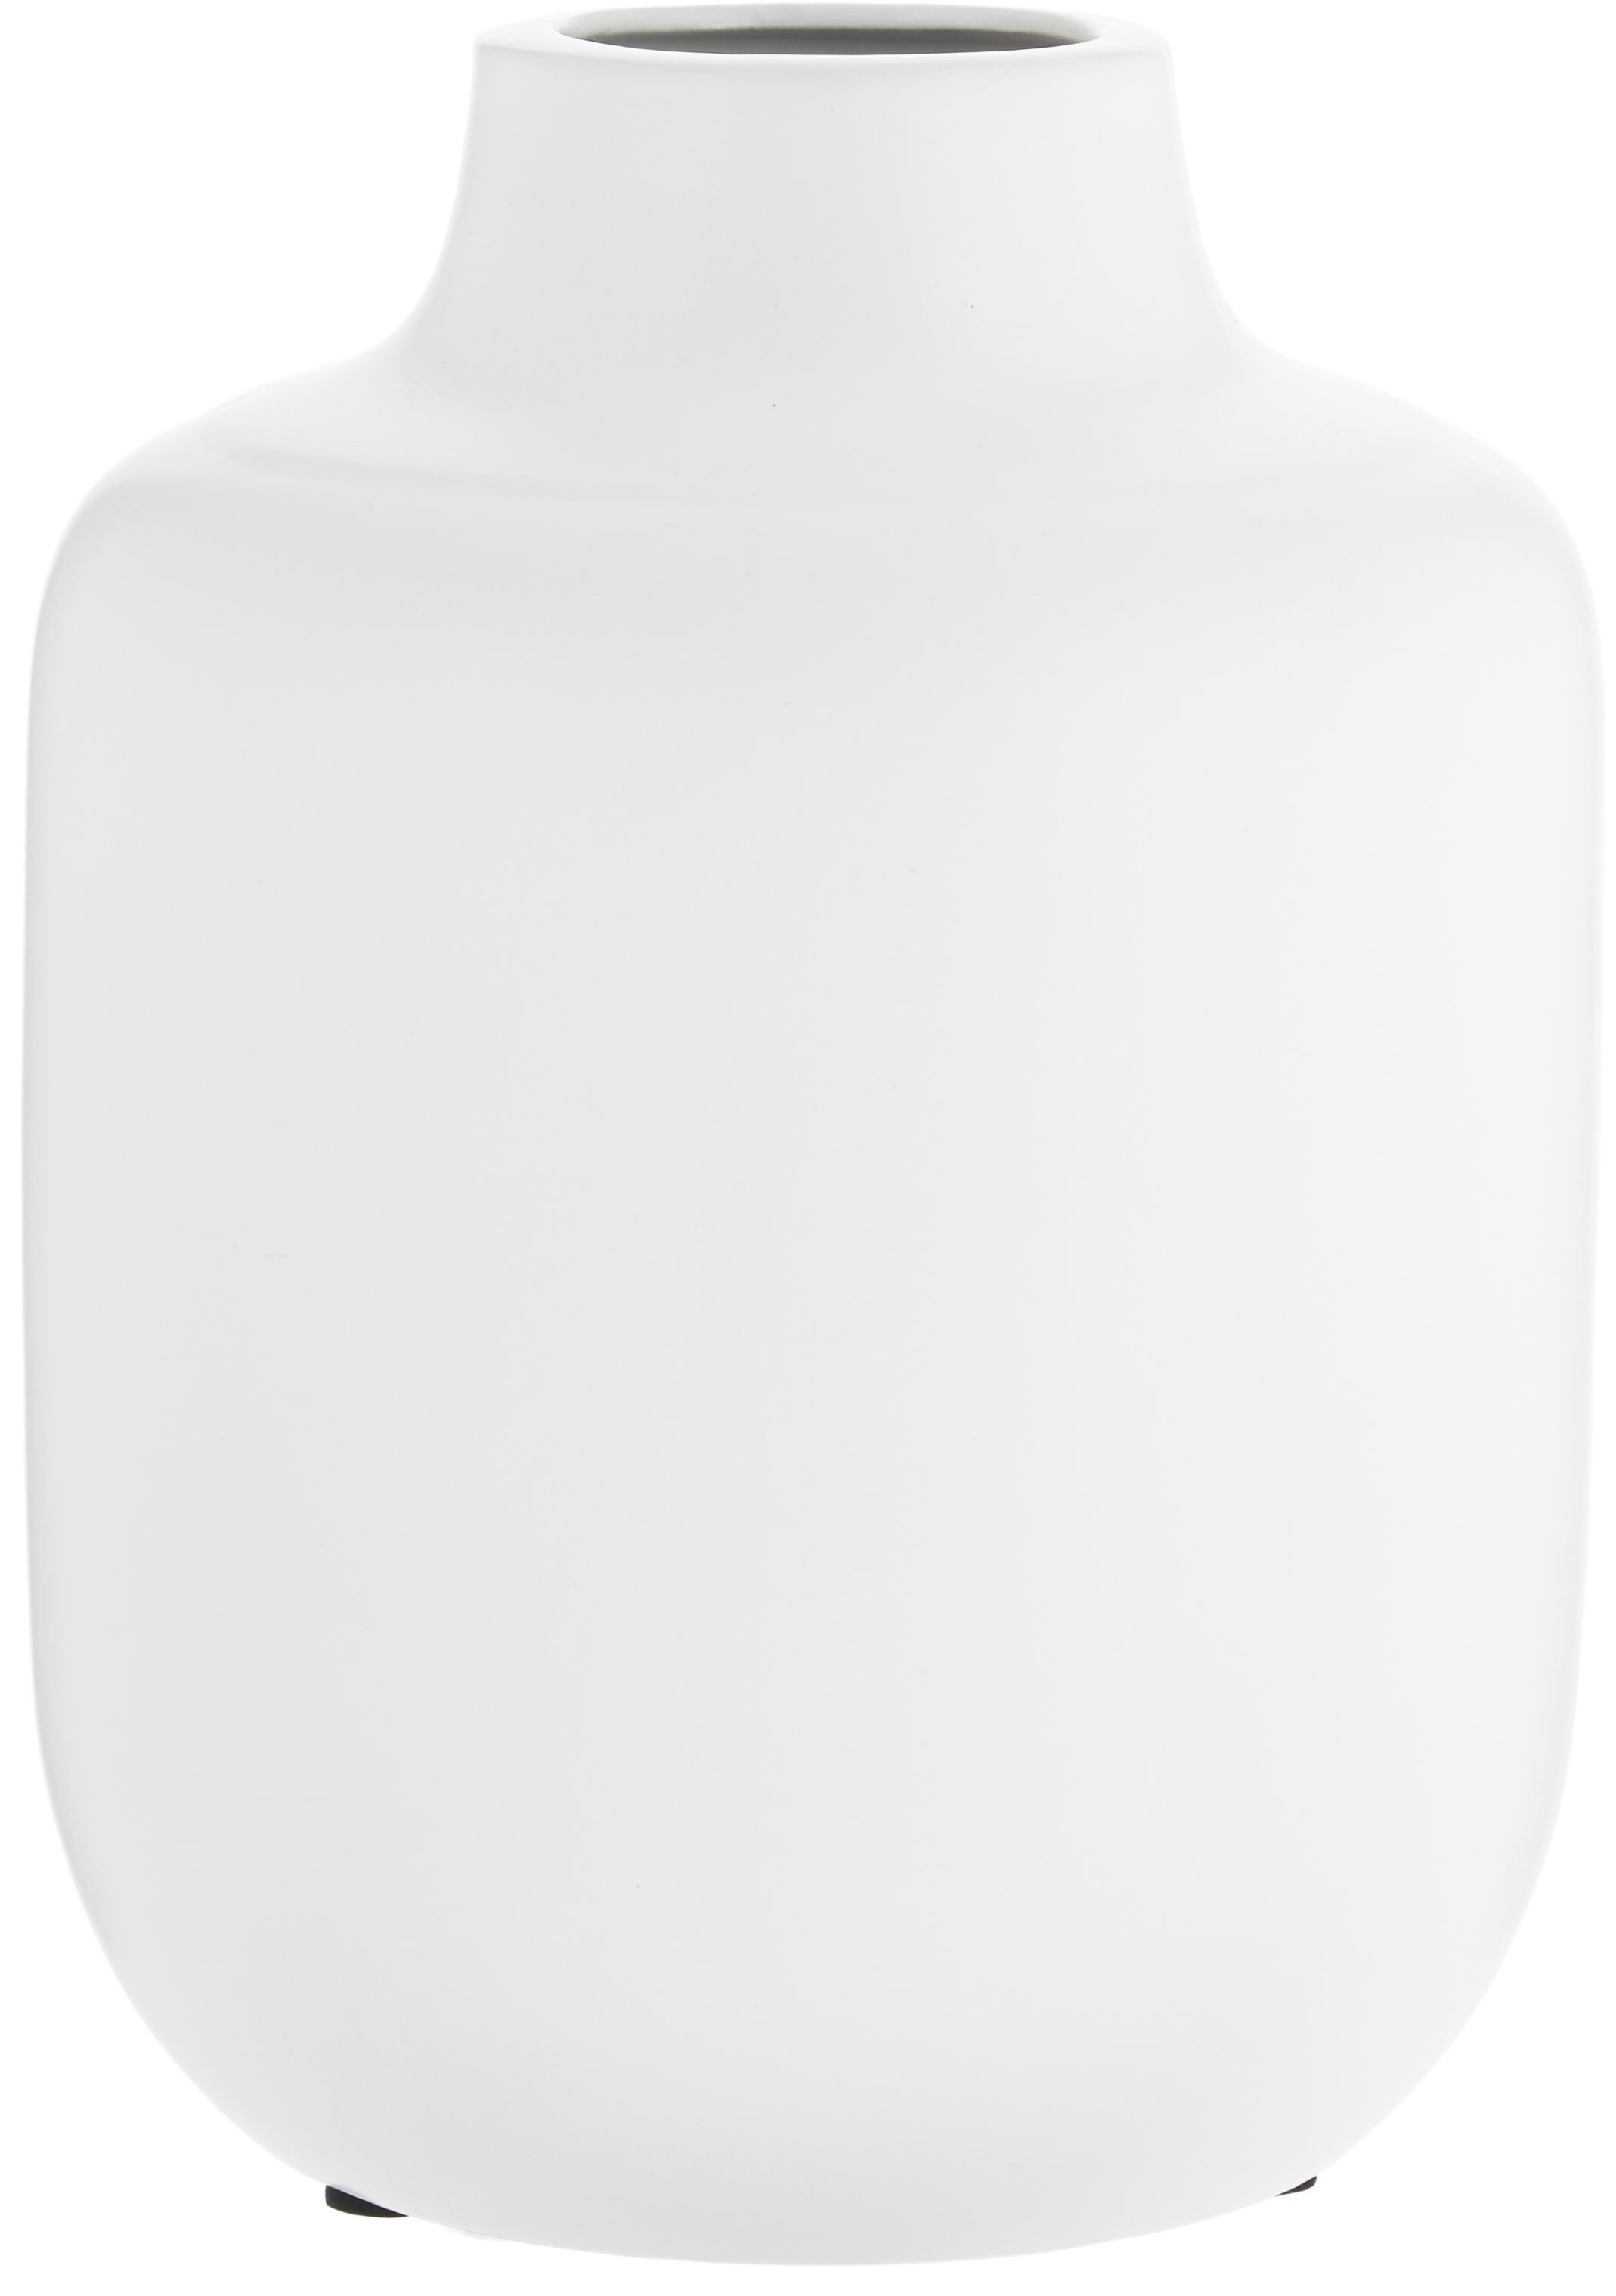 Porzellan-Vase Belle Blanc, Porzellan, Weiß, Ø 17 x H 20 cm